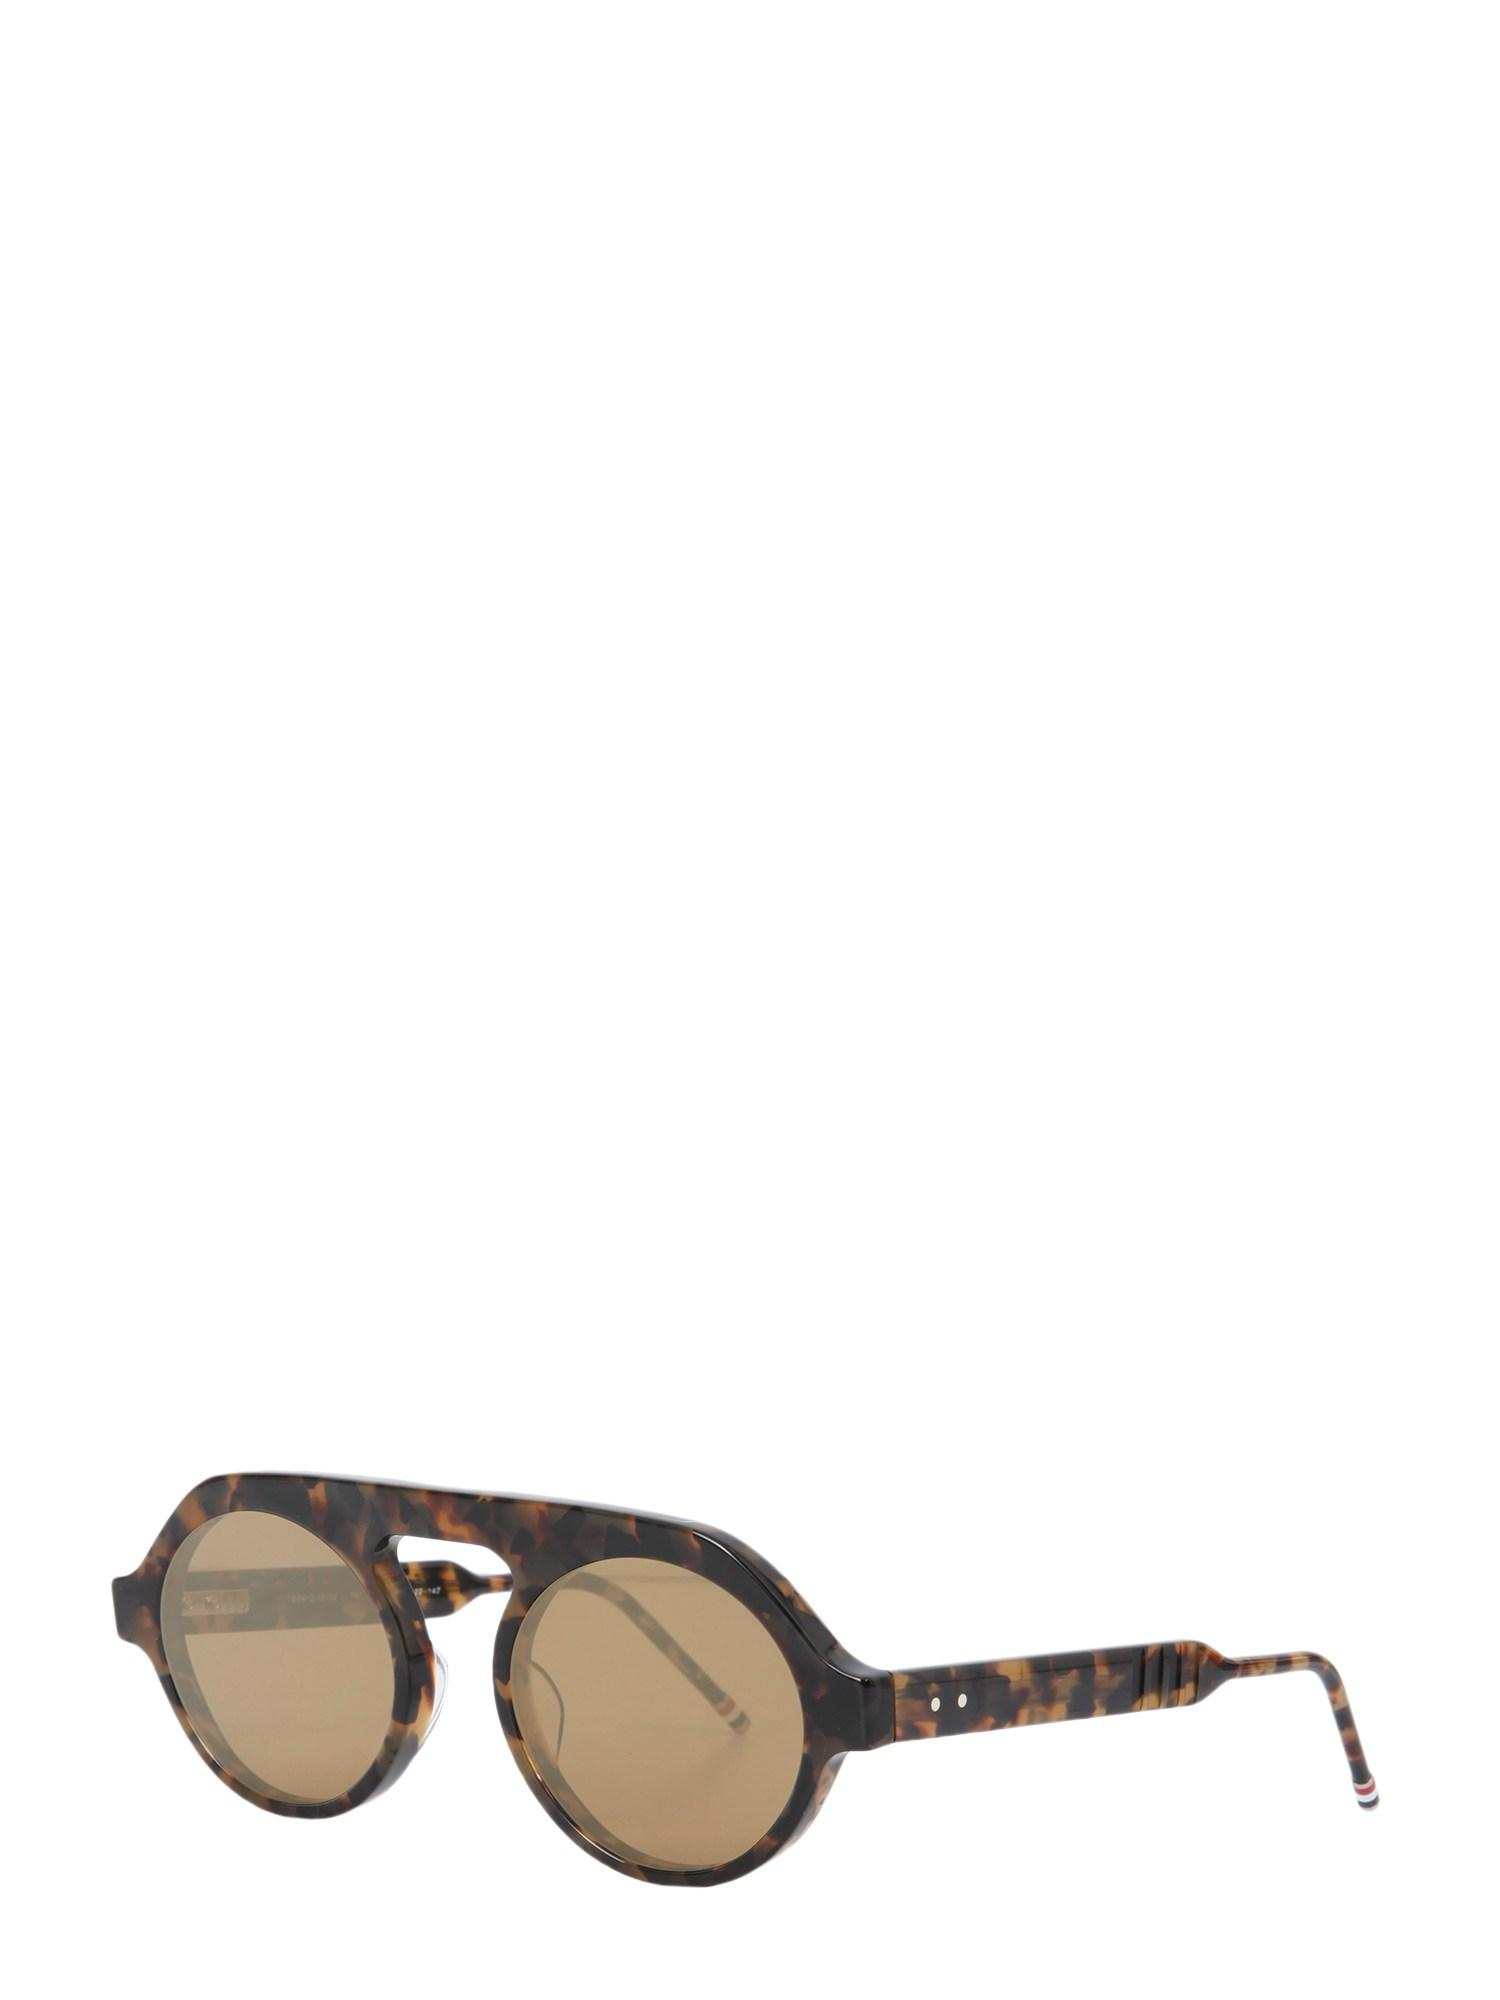 9ad68cdf266 Lyst - Thom Browne Acetate Round Aviator Sunglasses in Brown